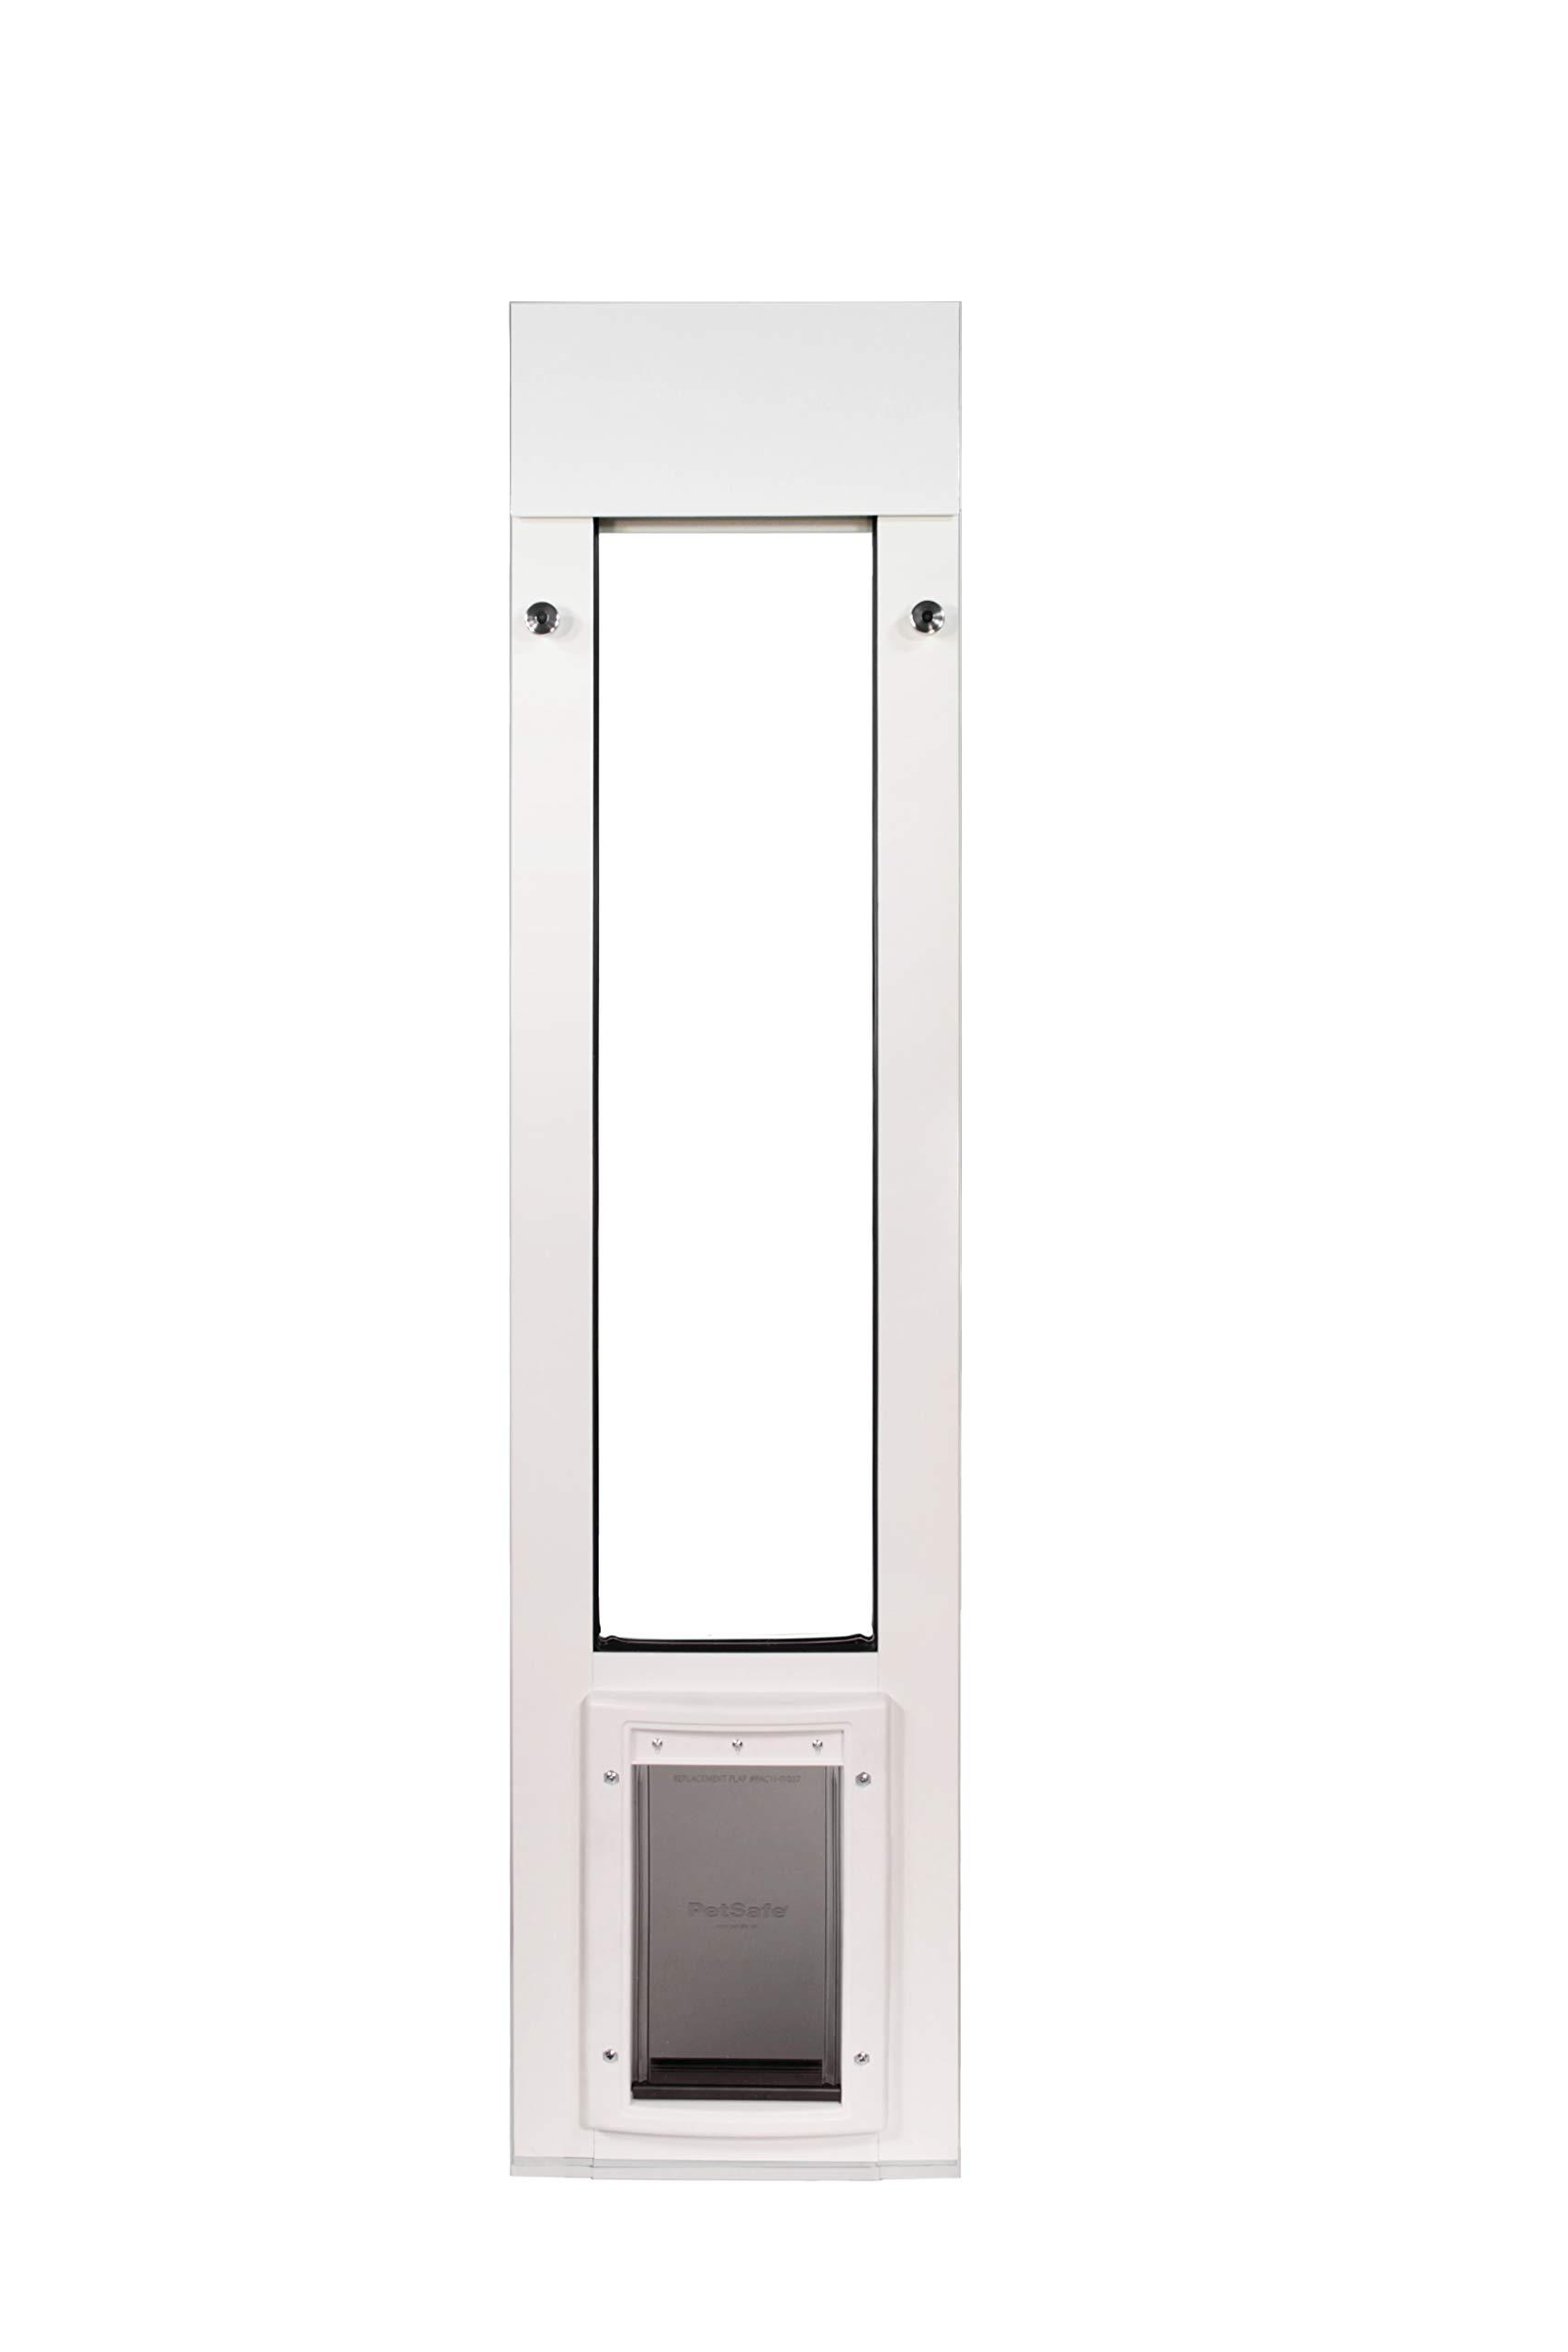 Patio Pacific Inc. Cat Door for Horizontal Sliding Windows with Small Plastic Pet Door by Patio Pacific Inc.